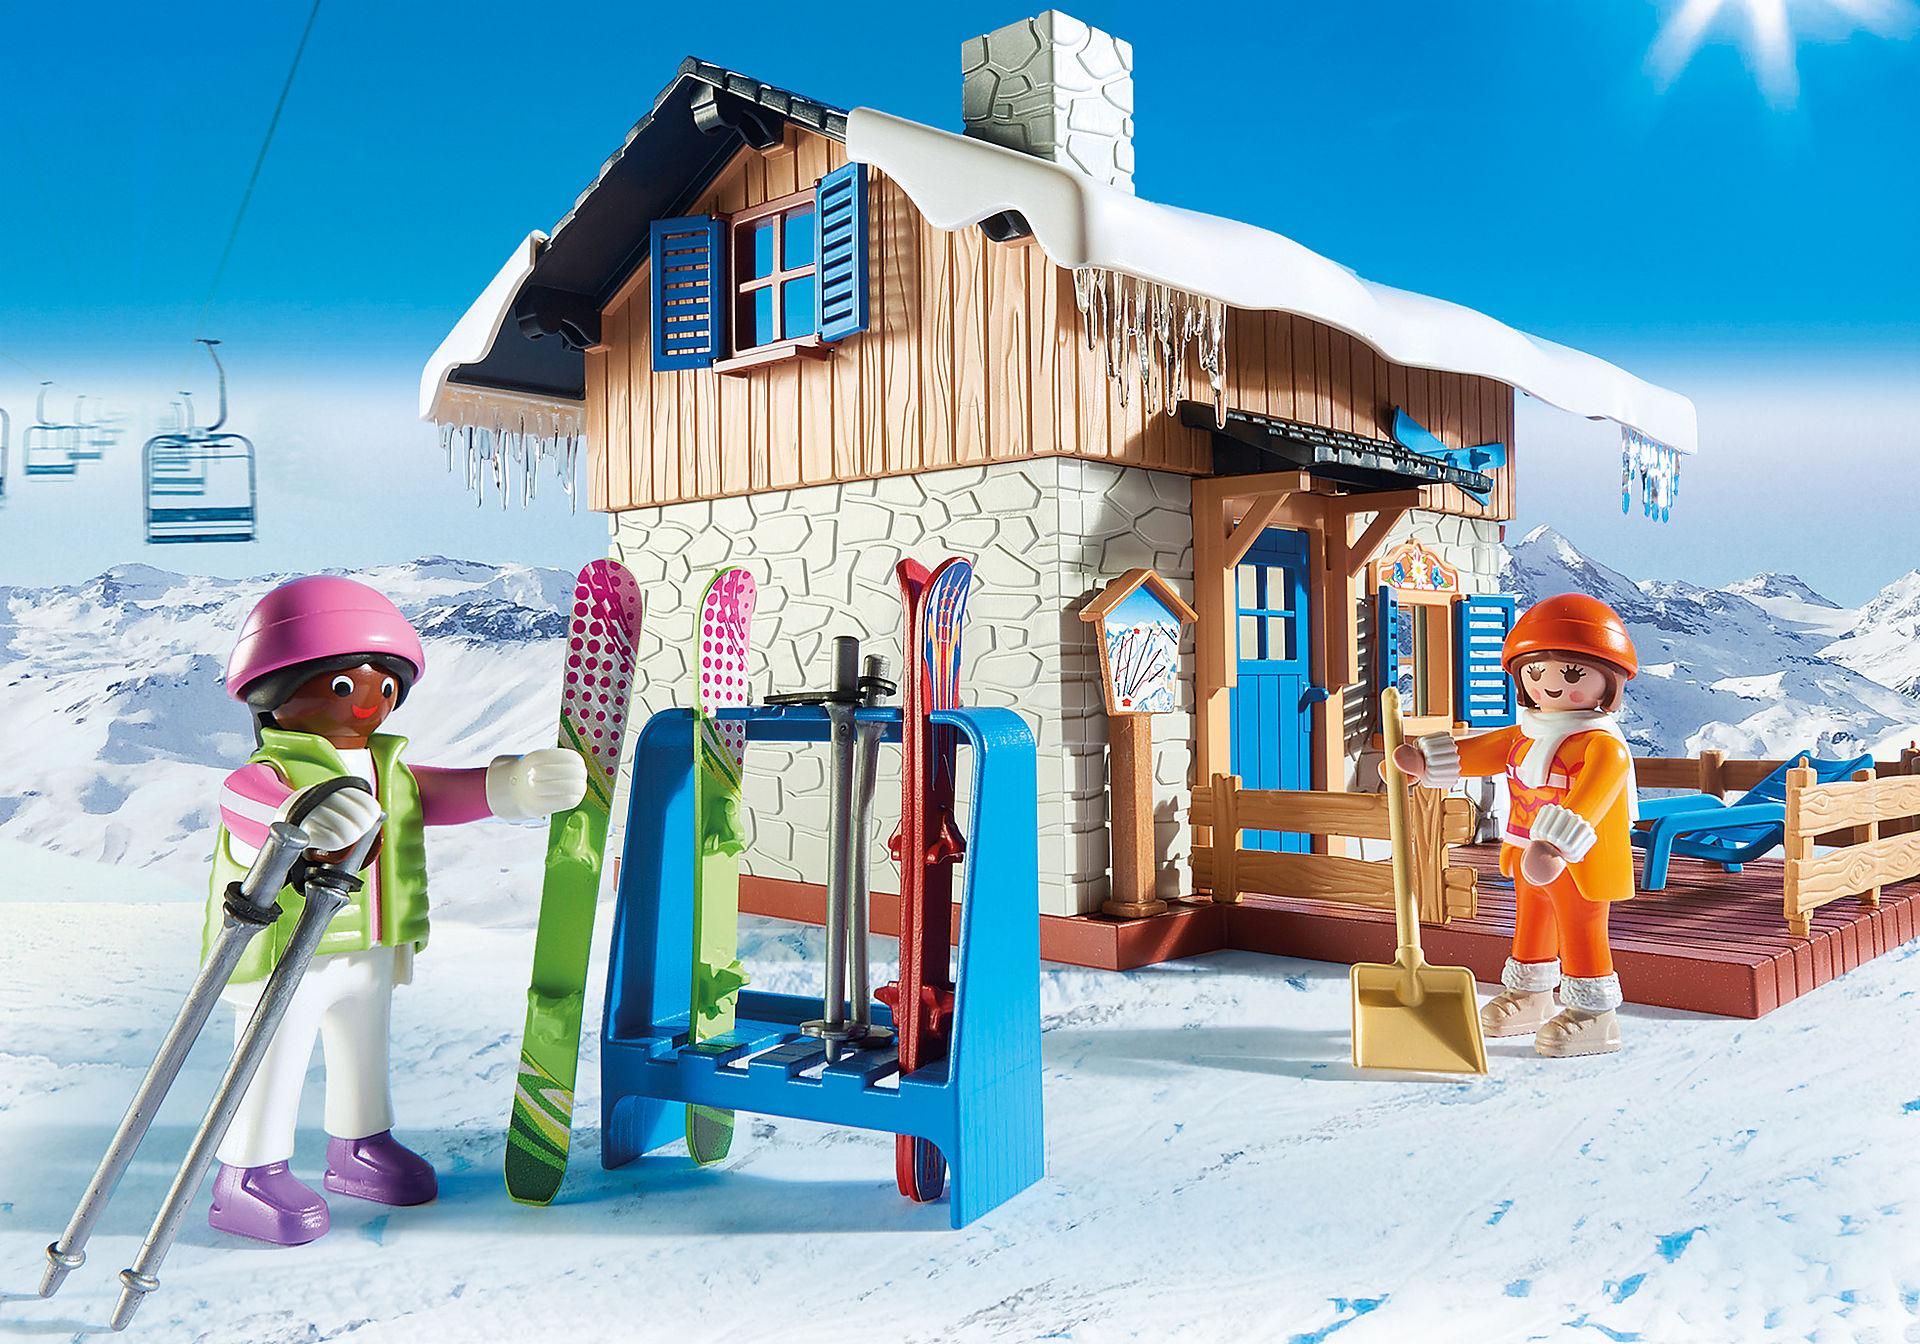 9280 Chalet avec skieurs  zoom image8